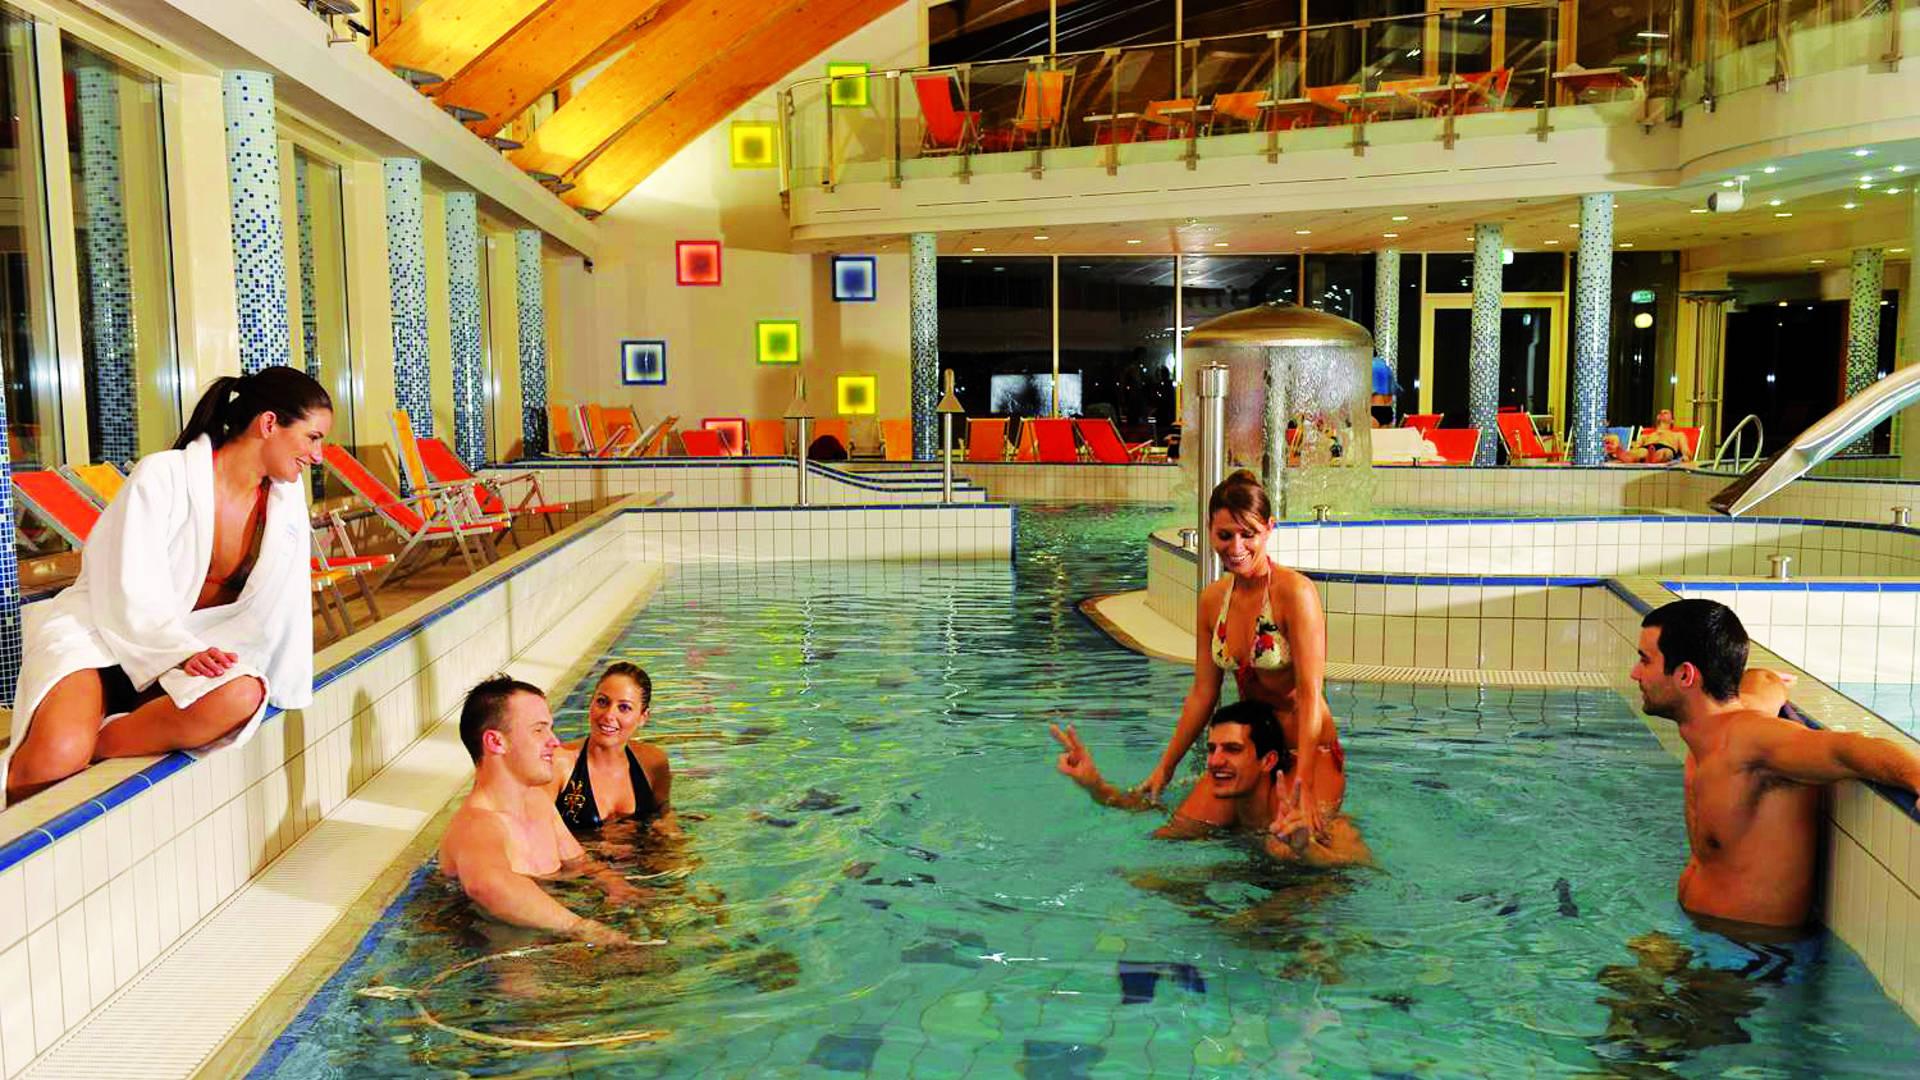 Velence Resort & Spa - Fénykép a medencéről